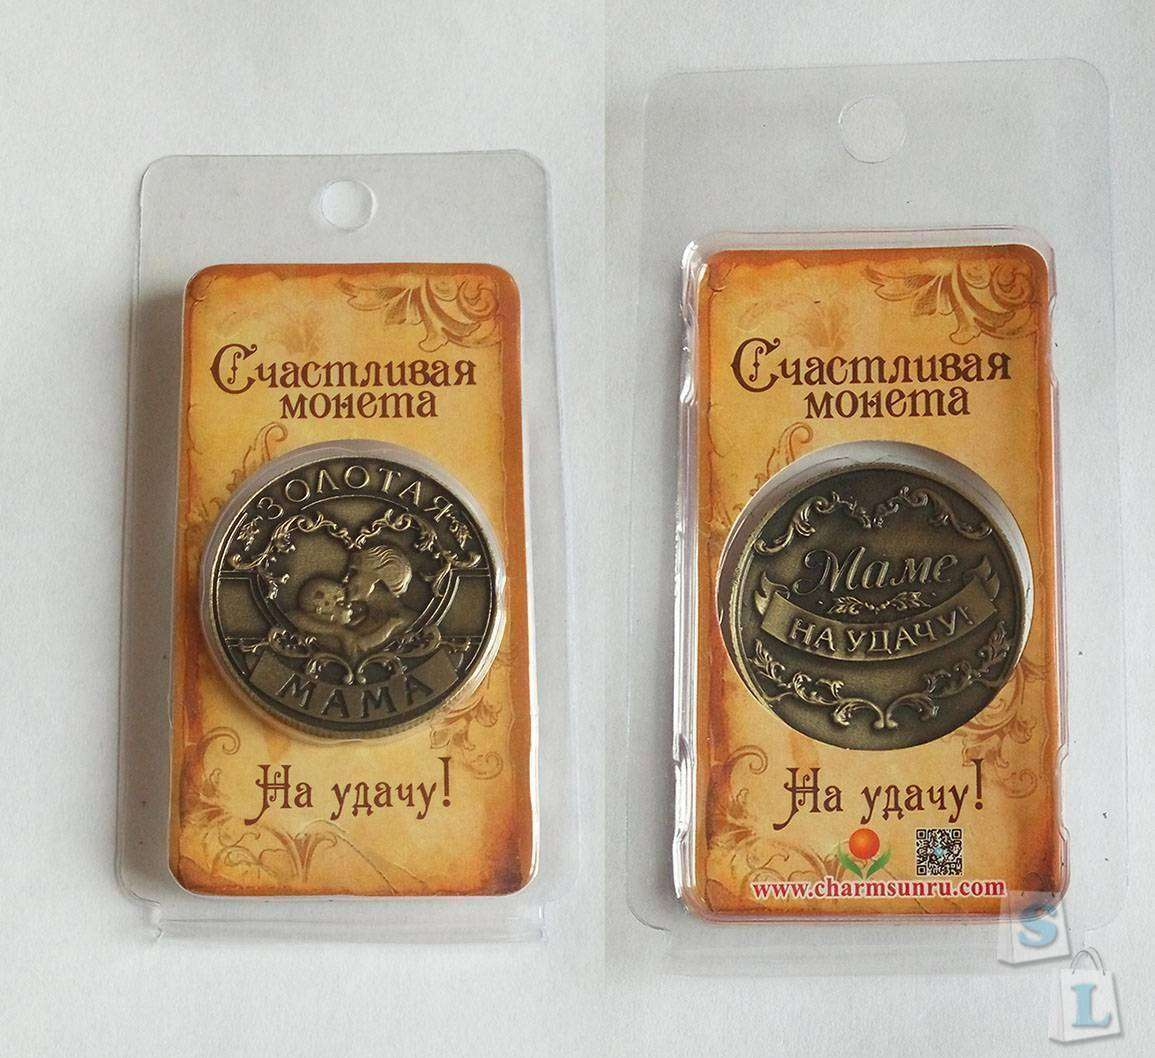 Aliexpress: Счастливая монета 'Золотая Мама'